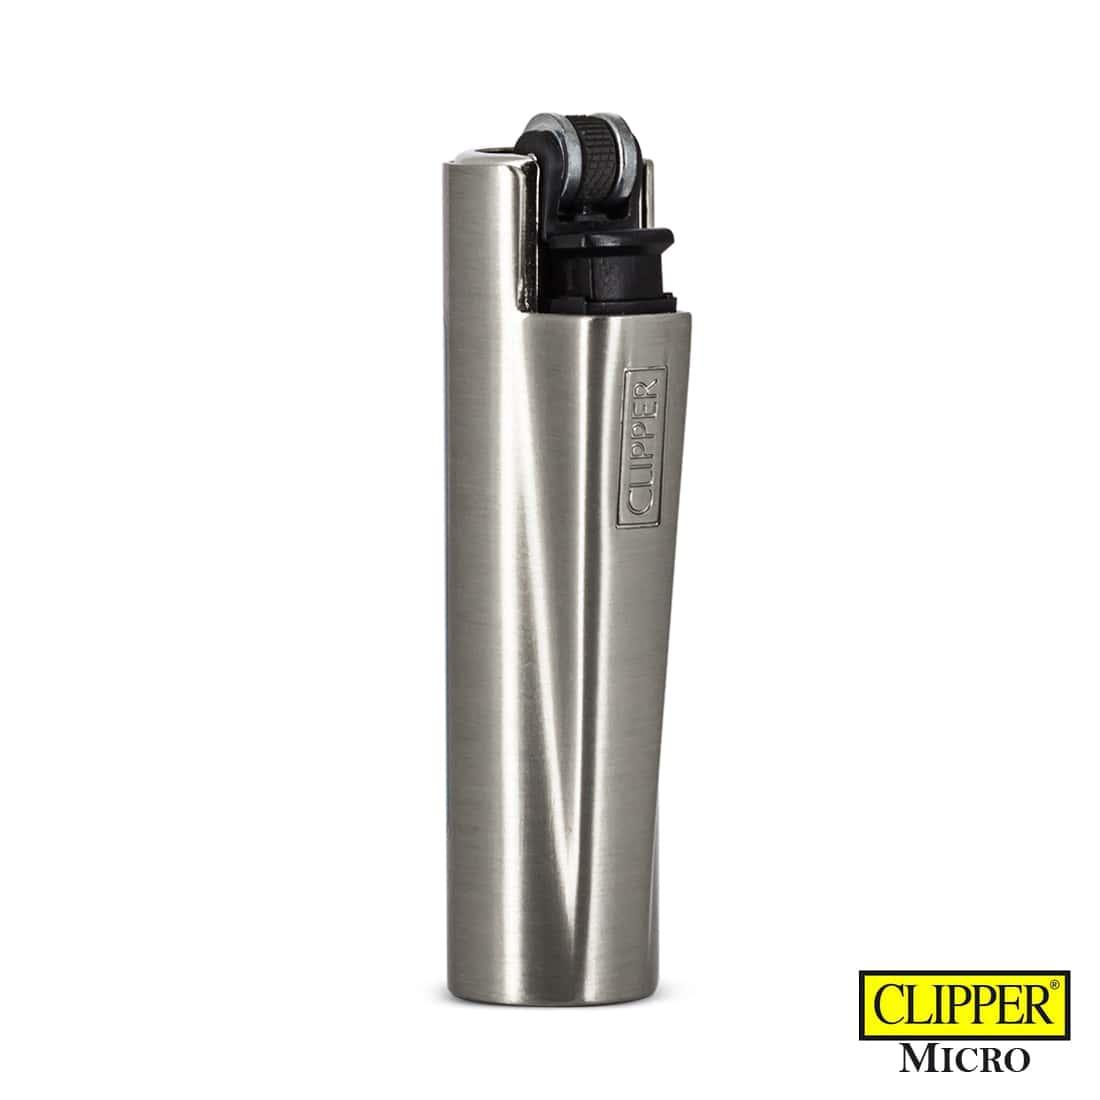 Photo #2 de Briquet Clipper Micro Cover Métal USA